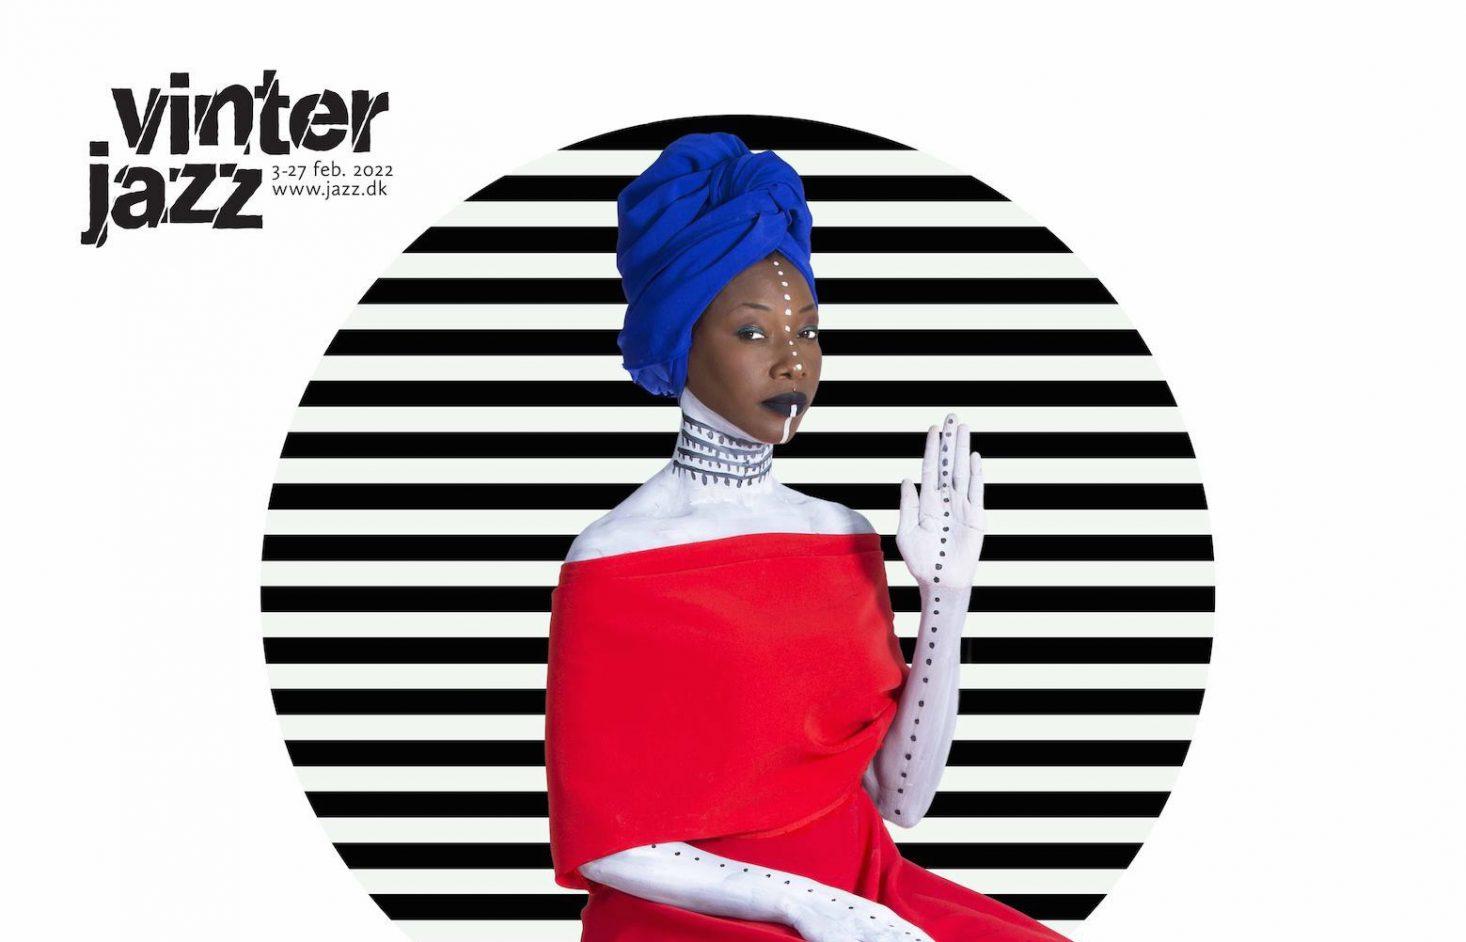 Fatoumata Diawara & DR Big Band join forces for two Vinterjazz-concerts in Svendborg and Copenhagen